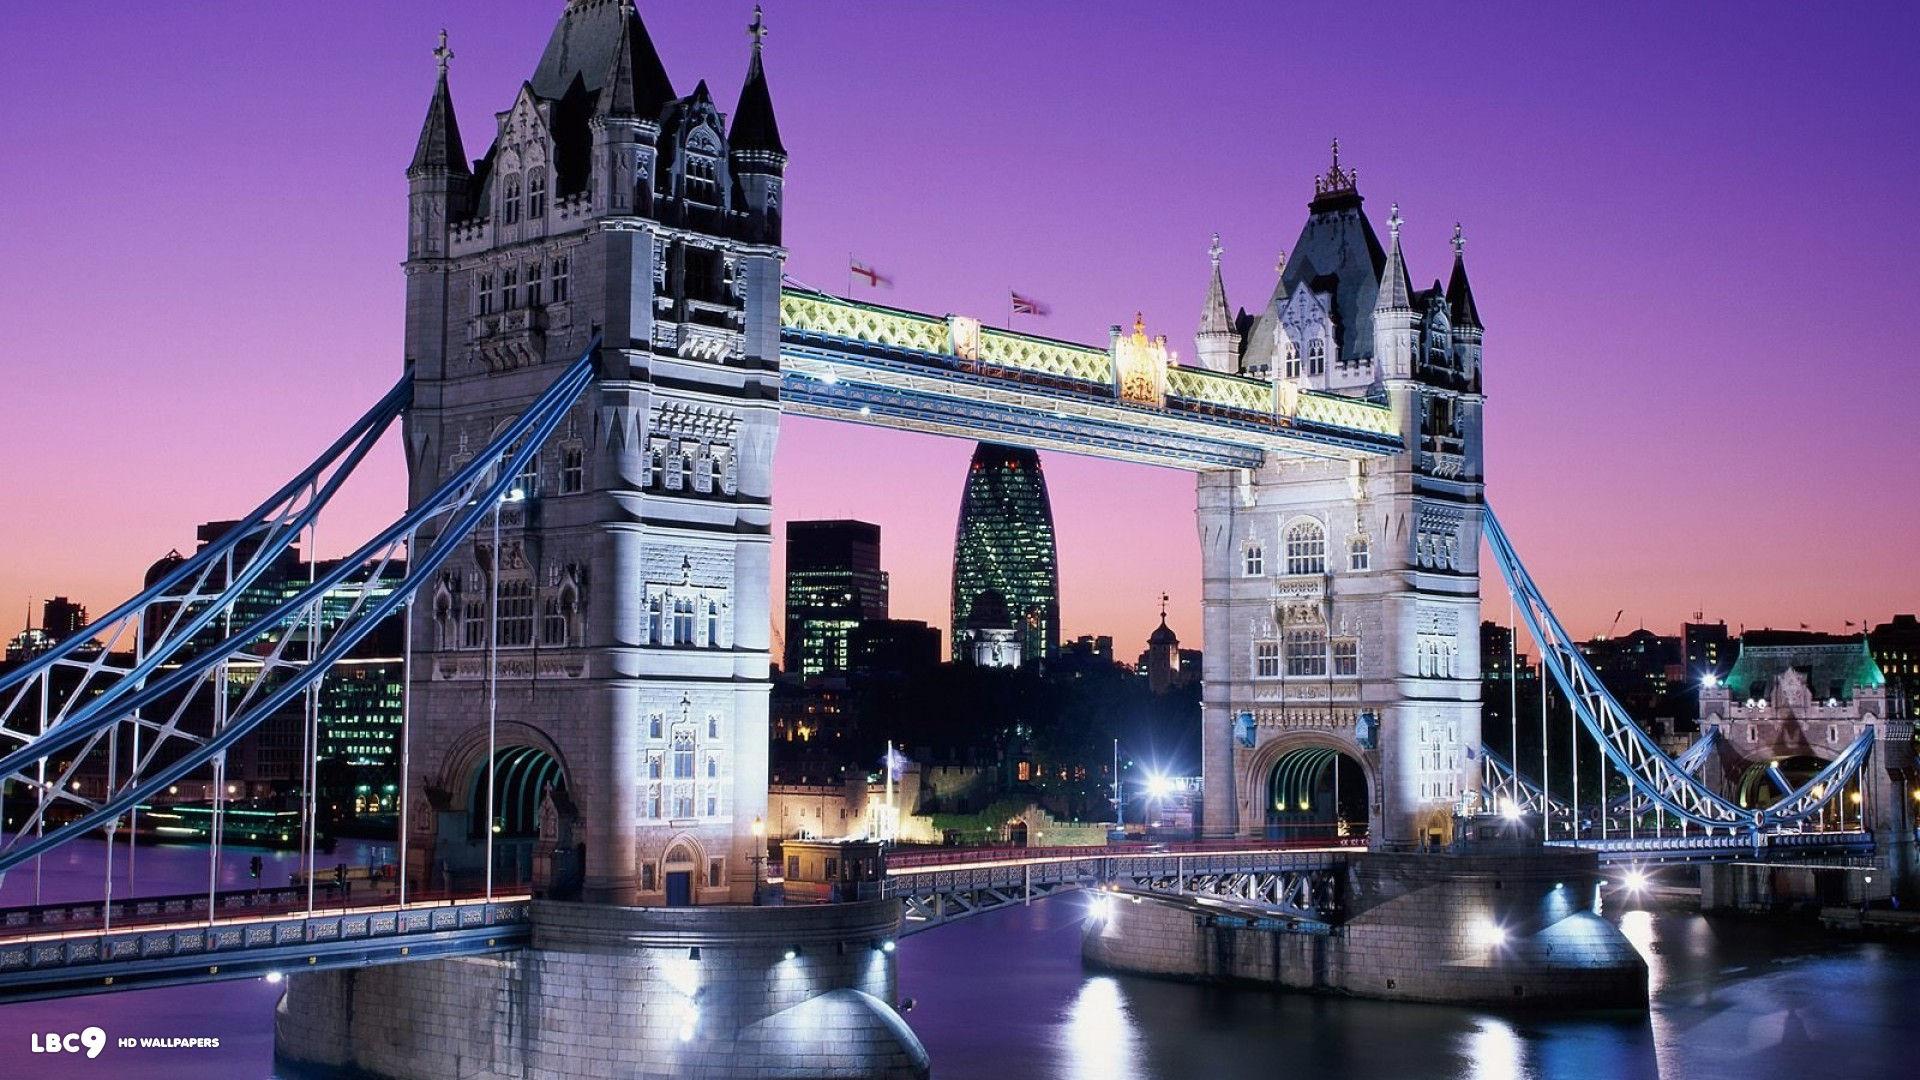 Res: 1920x1080, tower bridge at night london england 1080x1920